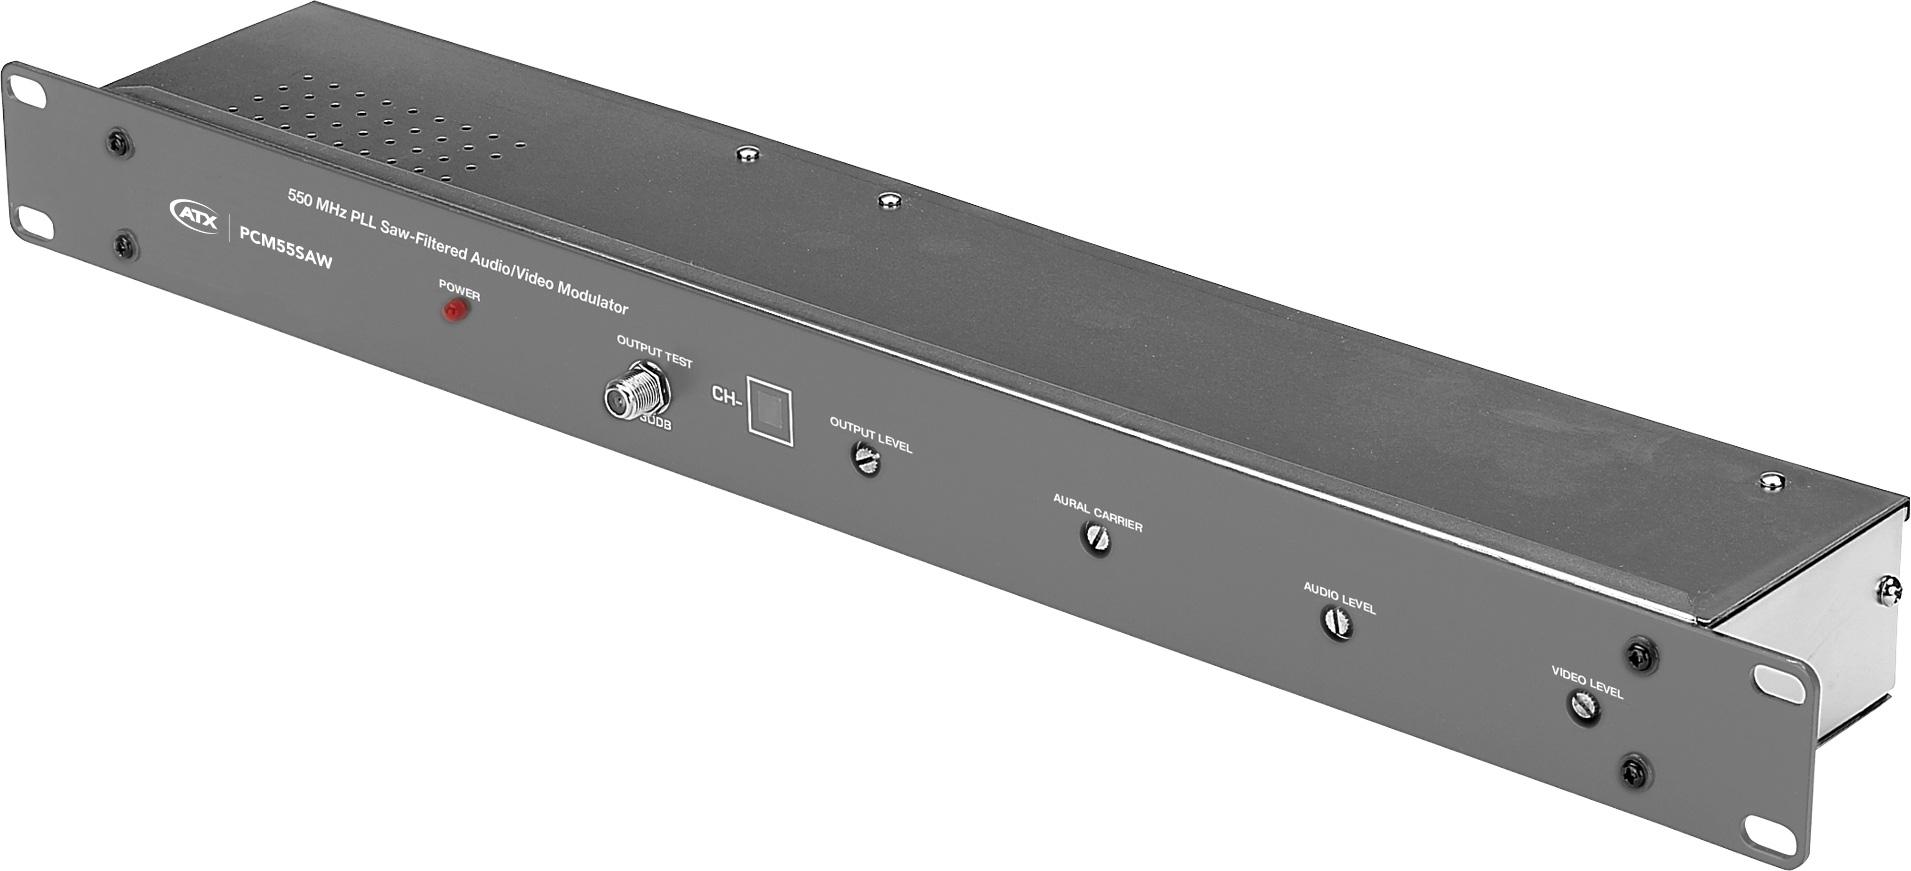 1 Channel Crystal A/V Modulator - Channel 2 PM-PCM55SAW-2